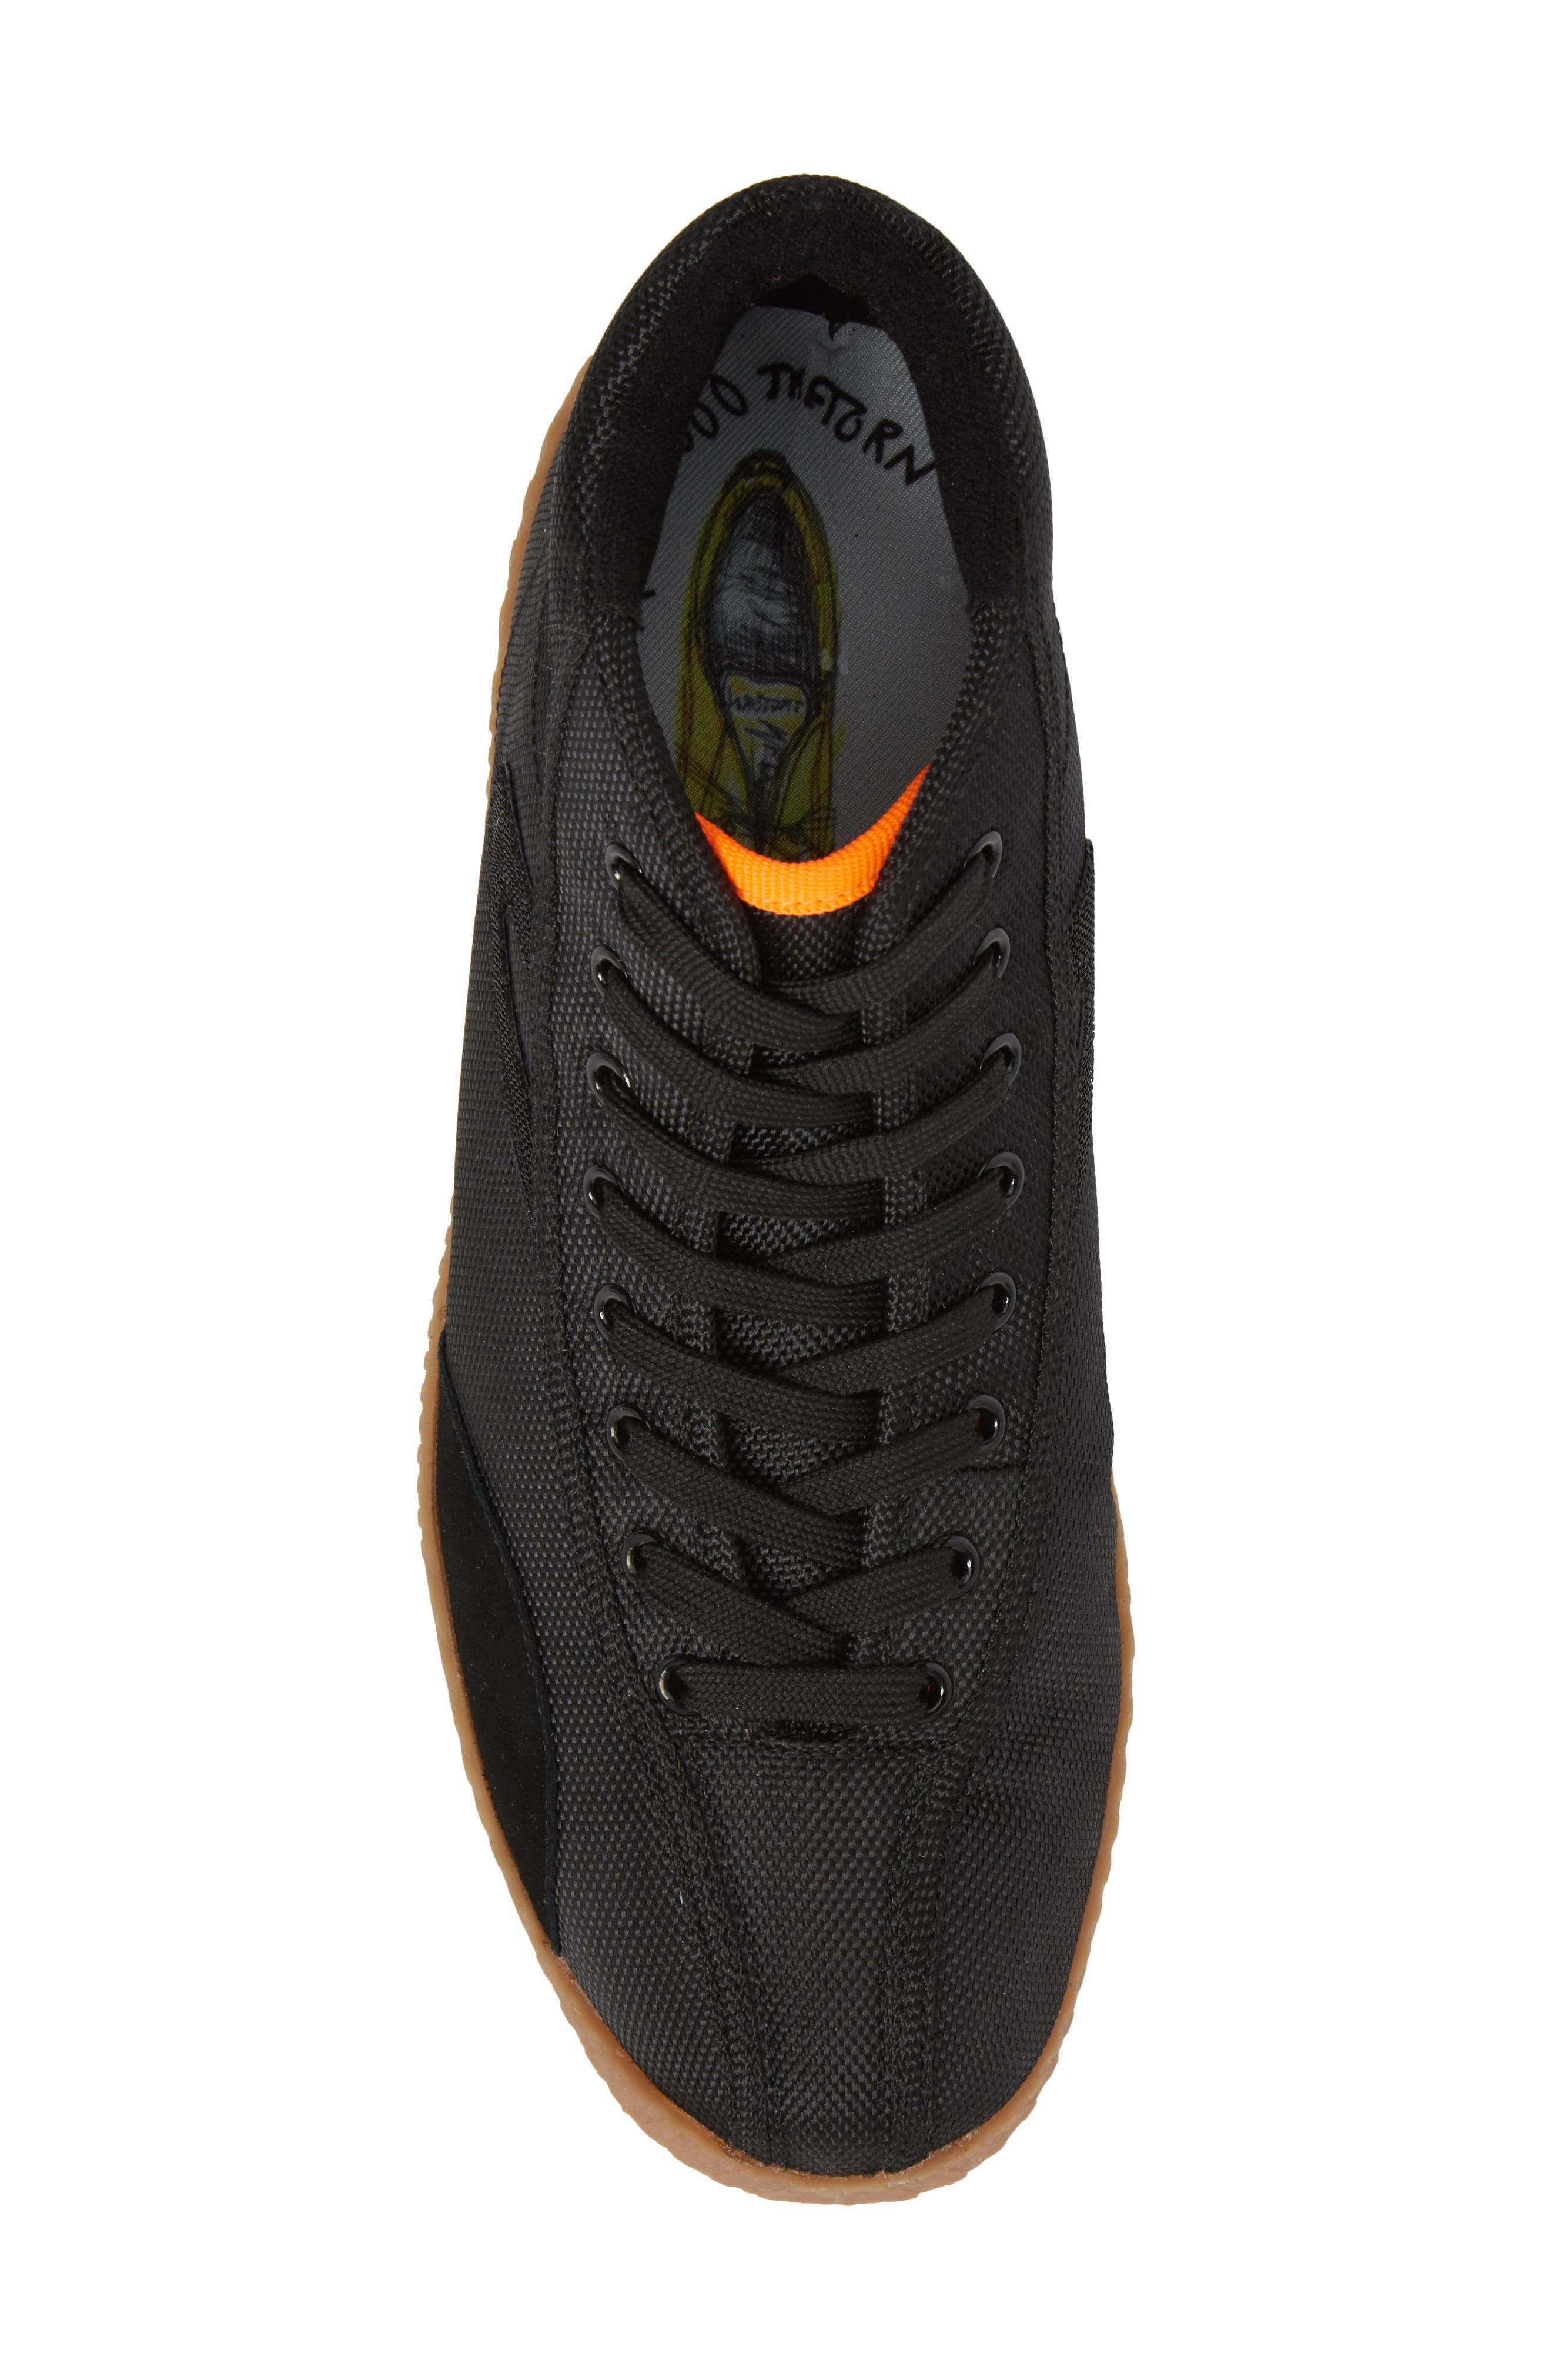 Andre 3000 Nylite High Top Sneaker,                             Alternate thumbnail 5, color,                             BLACK/ NEON ORANGE NYLON